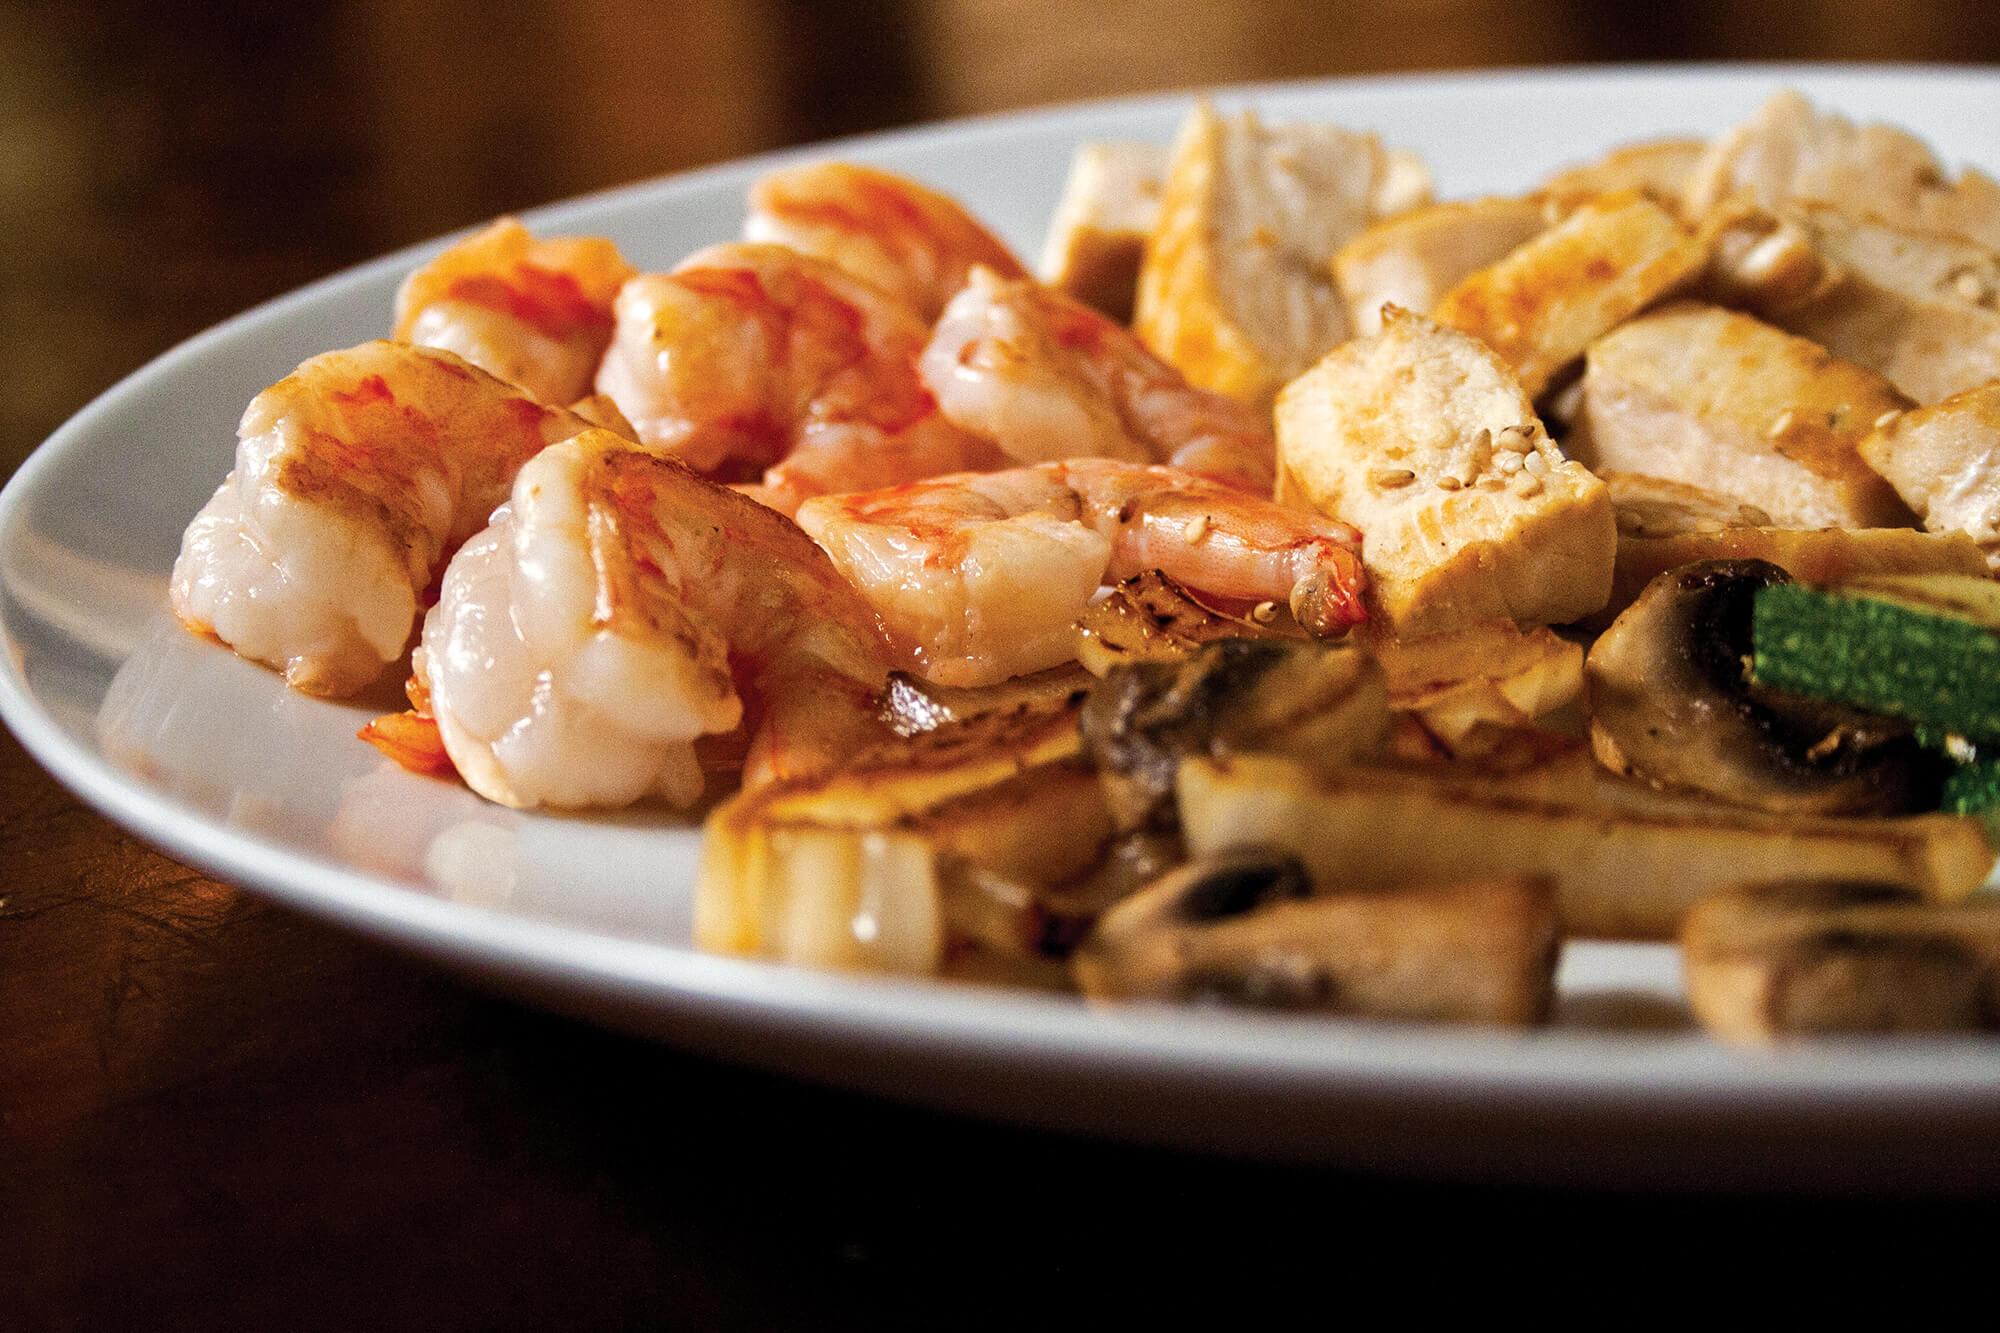 Family Meal-Shrimp & Chicken Family Meal-Shrimp-Chicken Benihana Family style meals